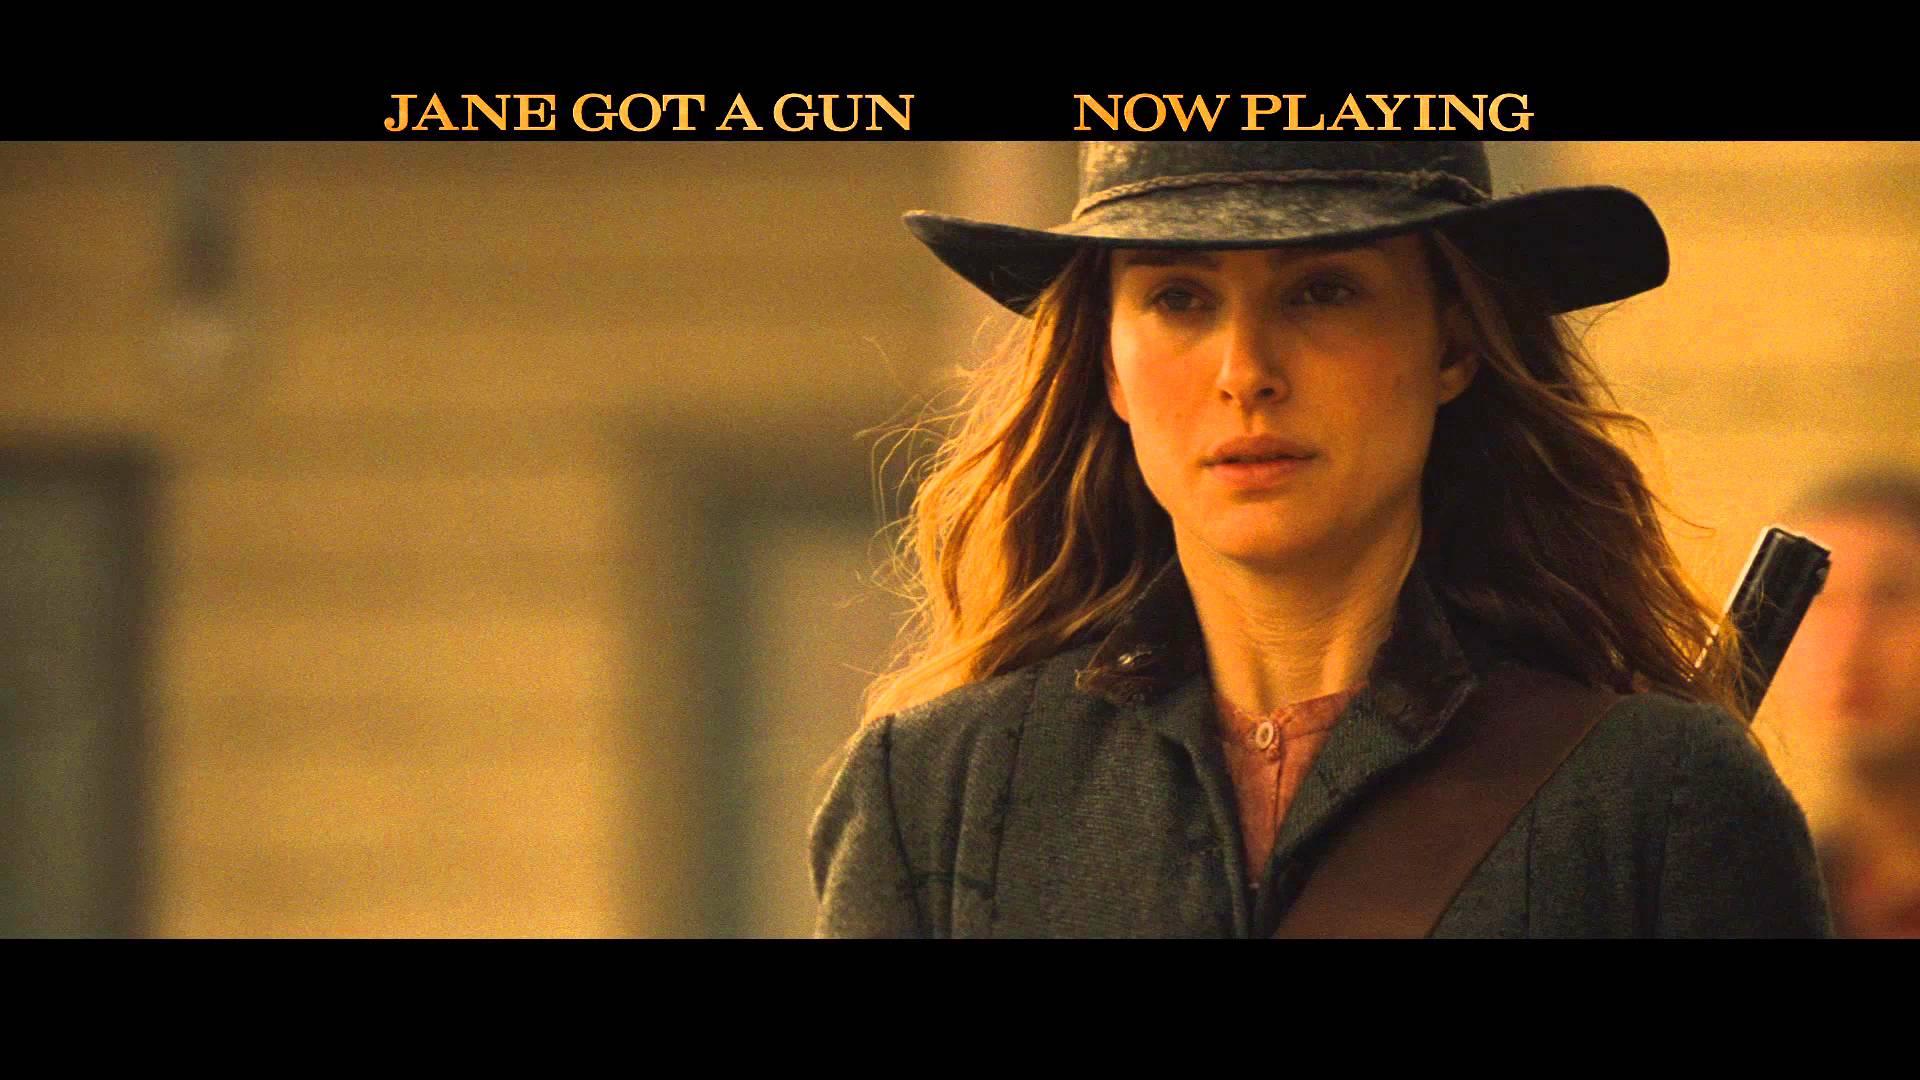 JANE GOT A GUN – Protect Your House